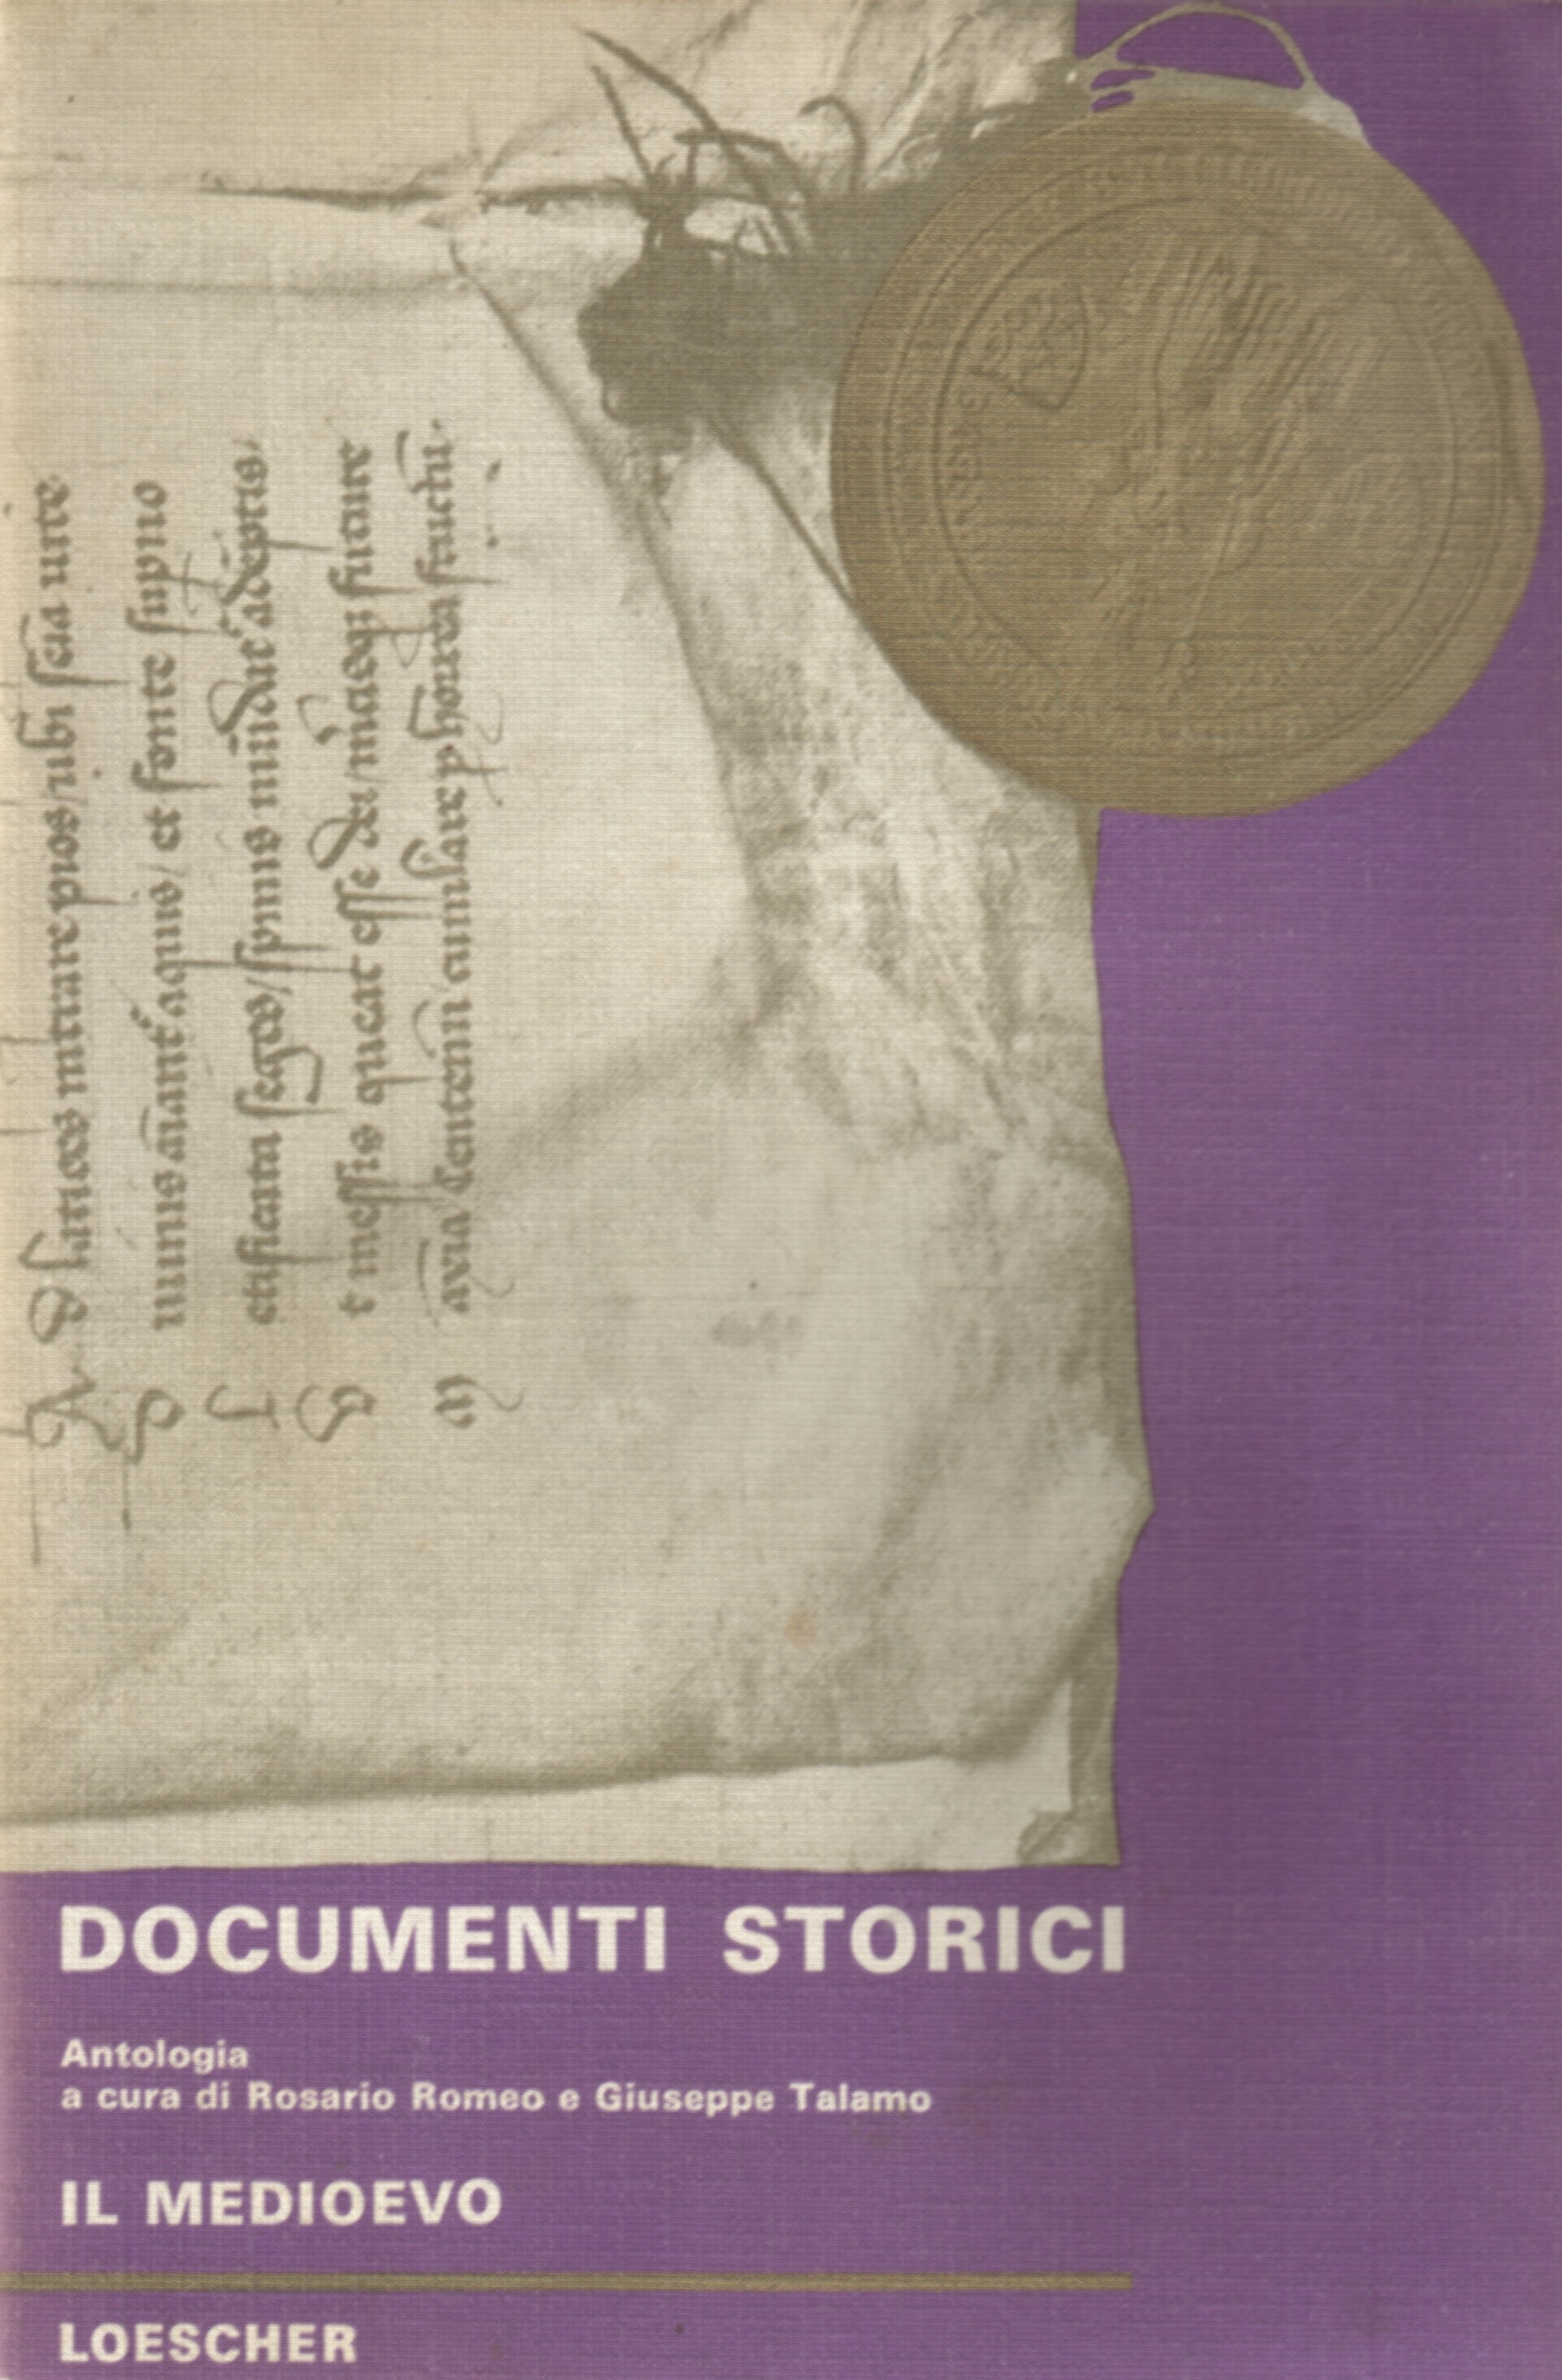 Documenti storici